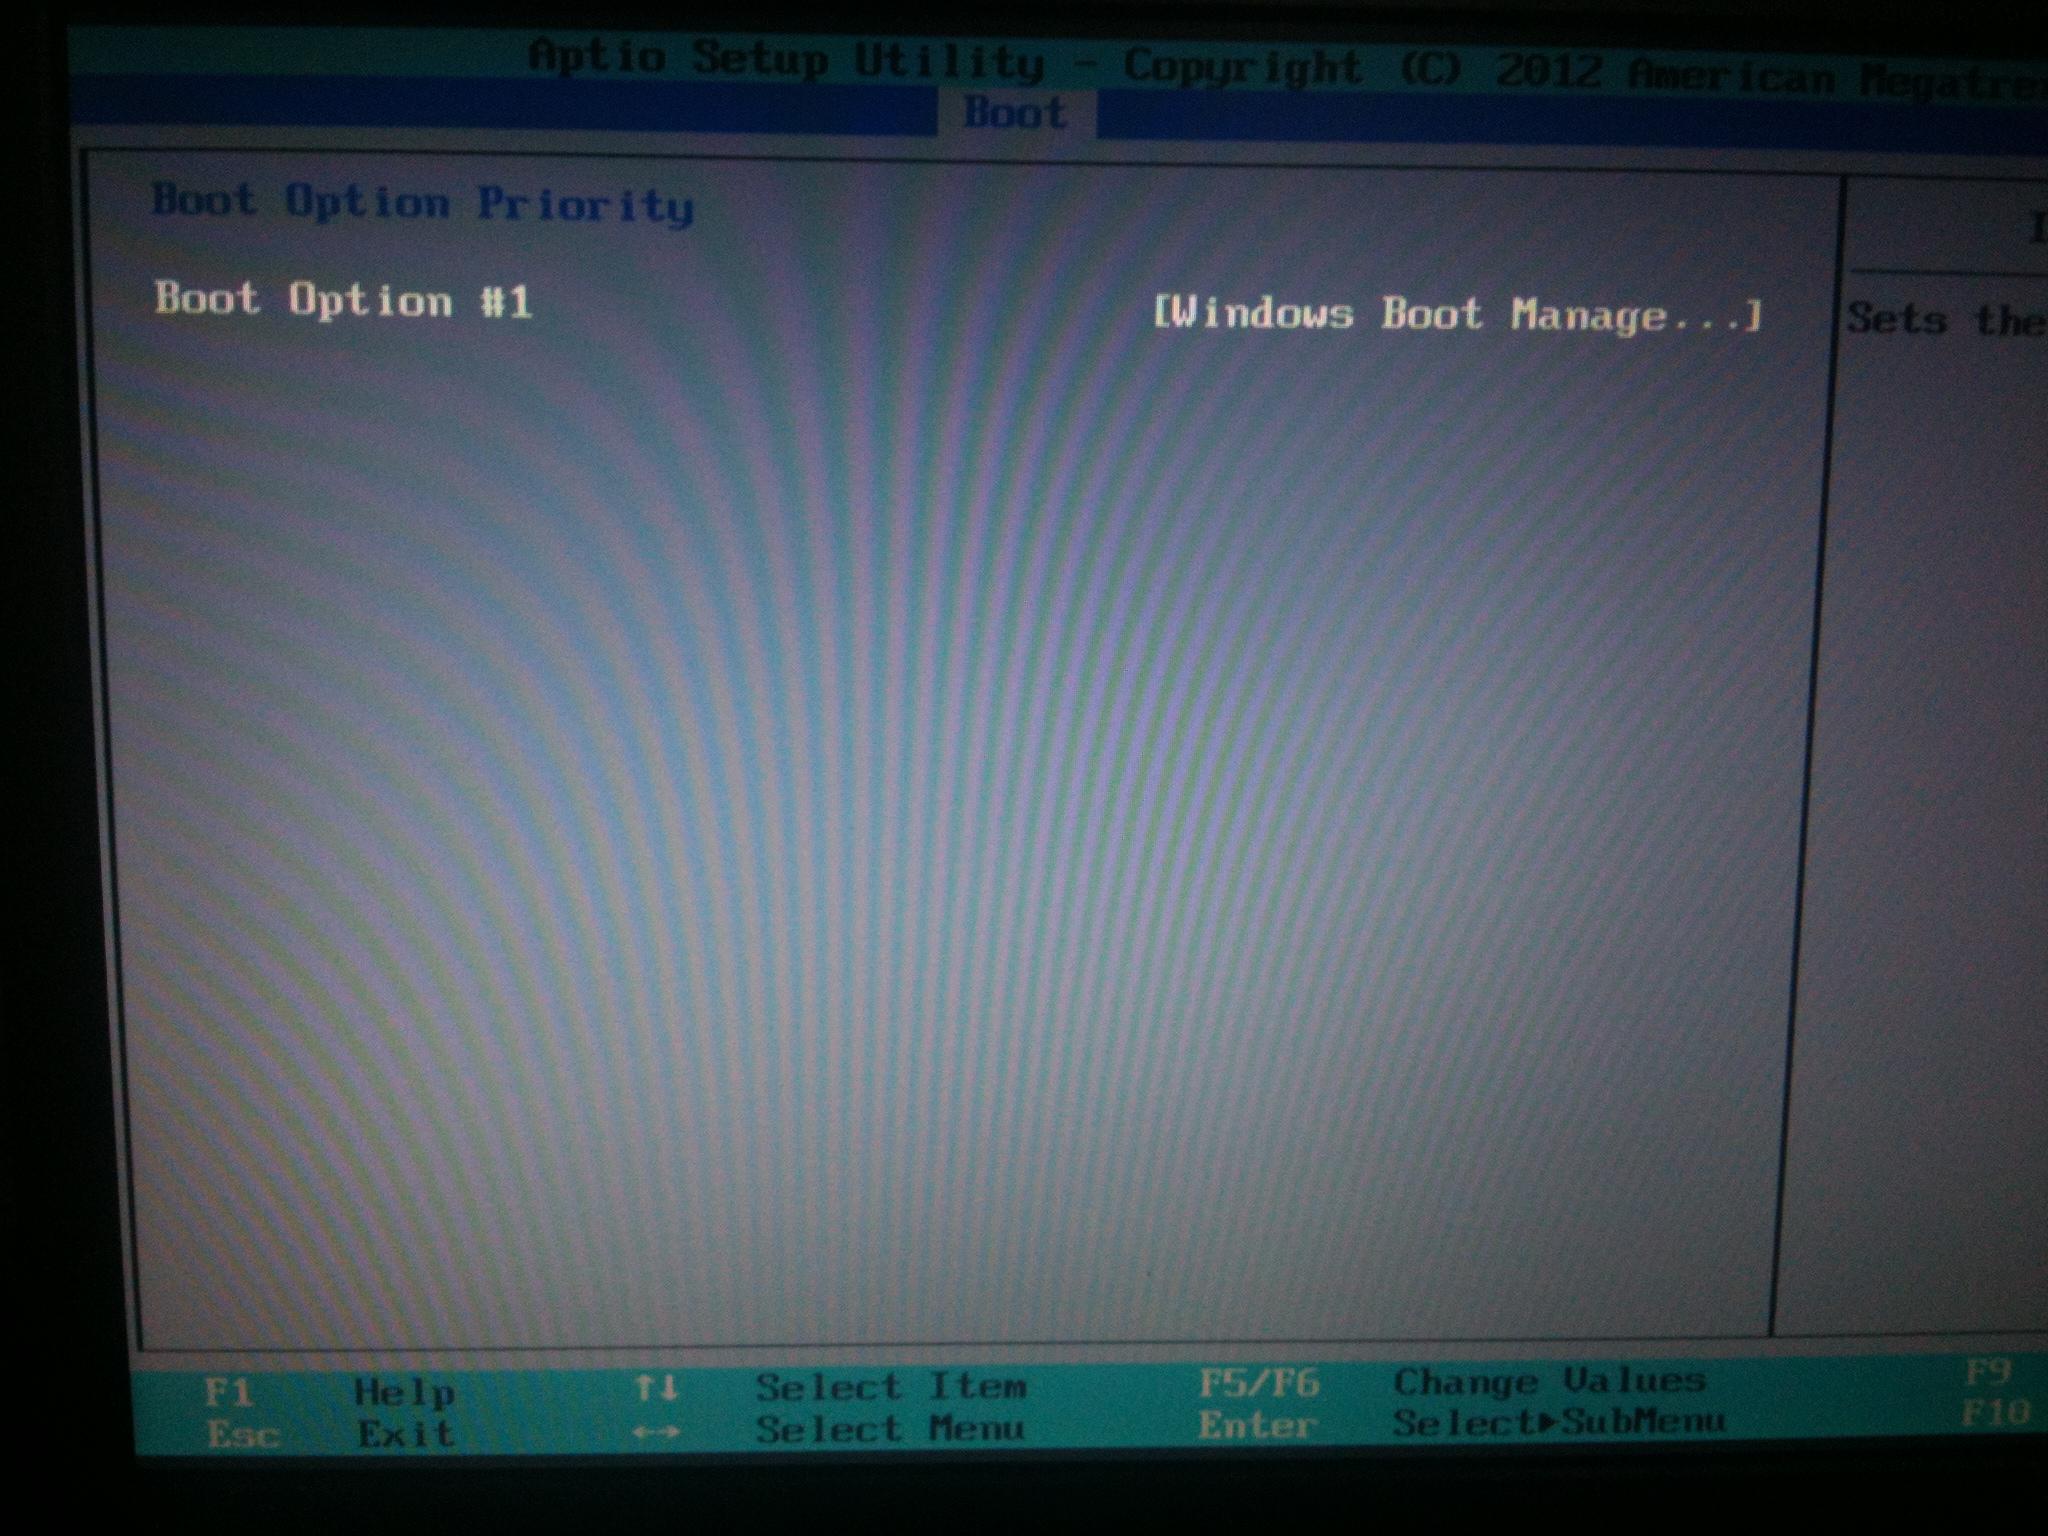 SAMSUNG NP350V5C-S09PL - Podzia� dysku na partycje, Windows 8